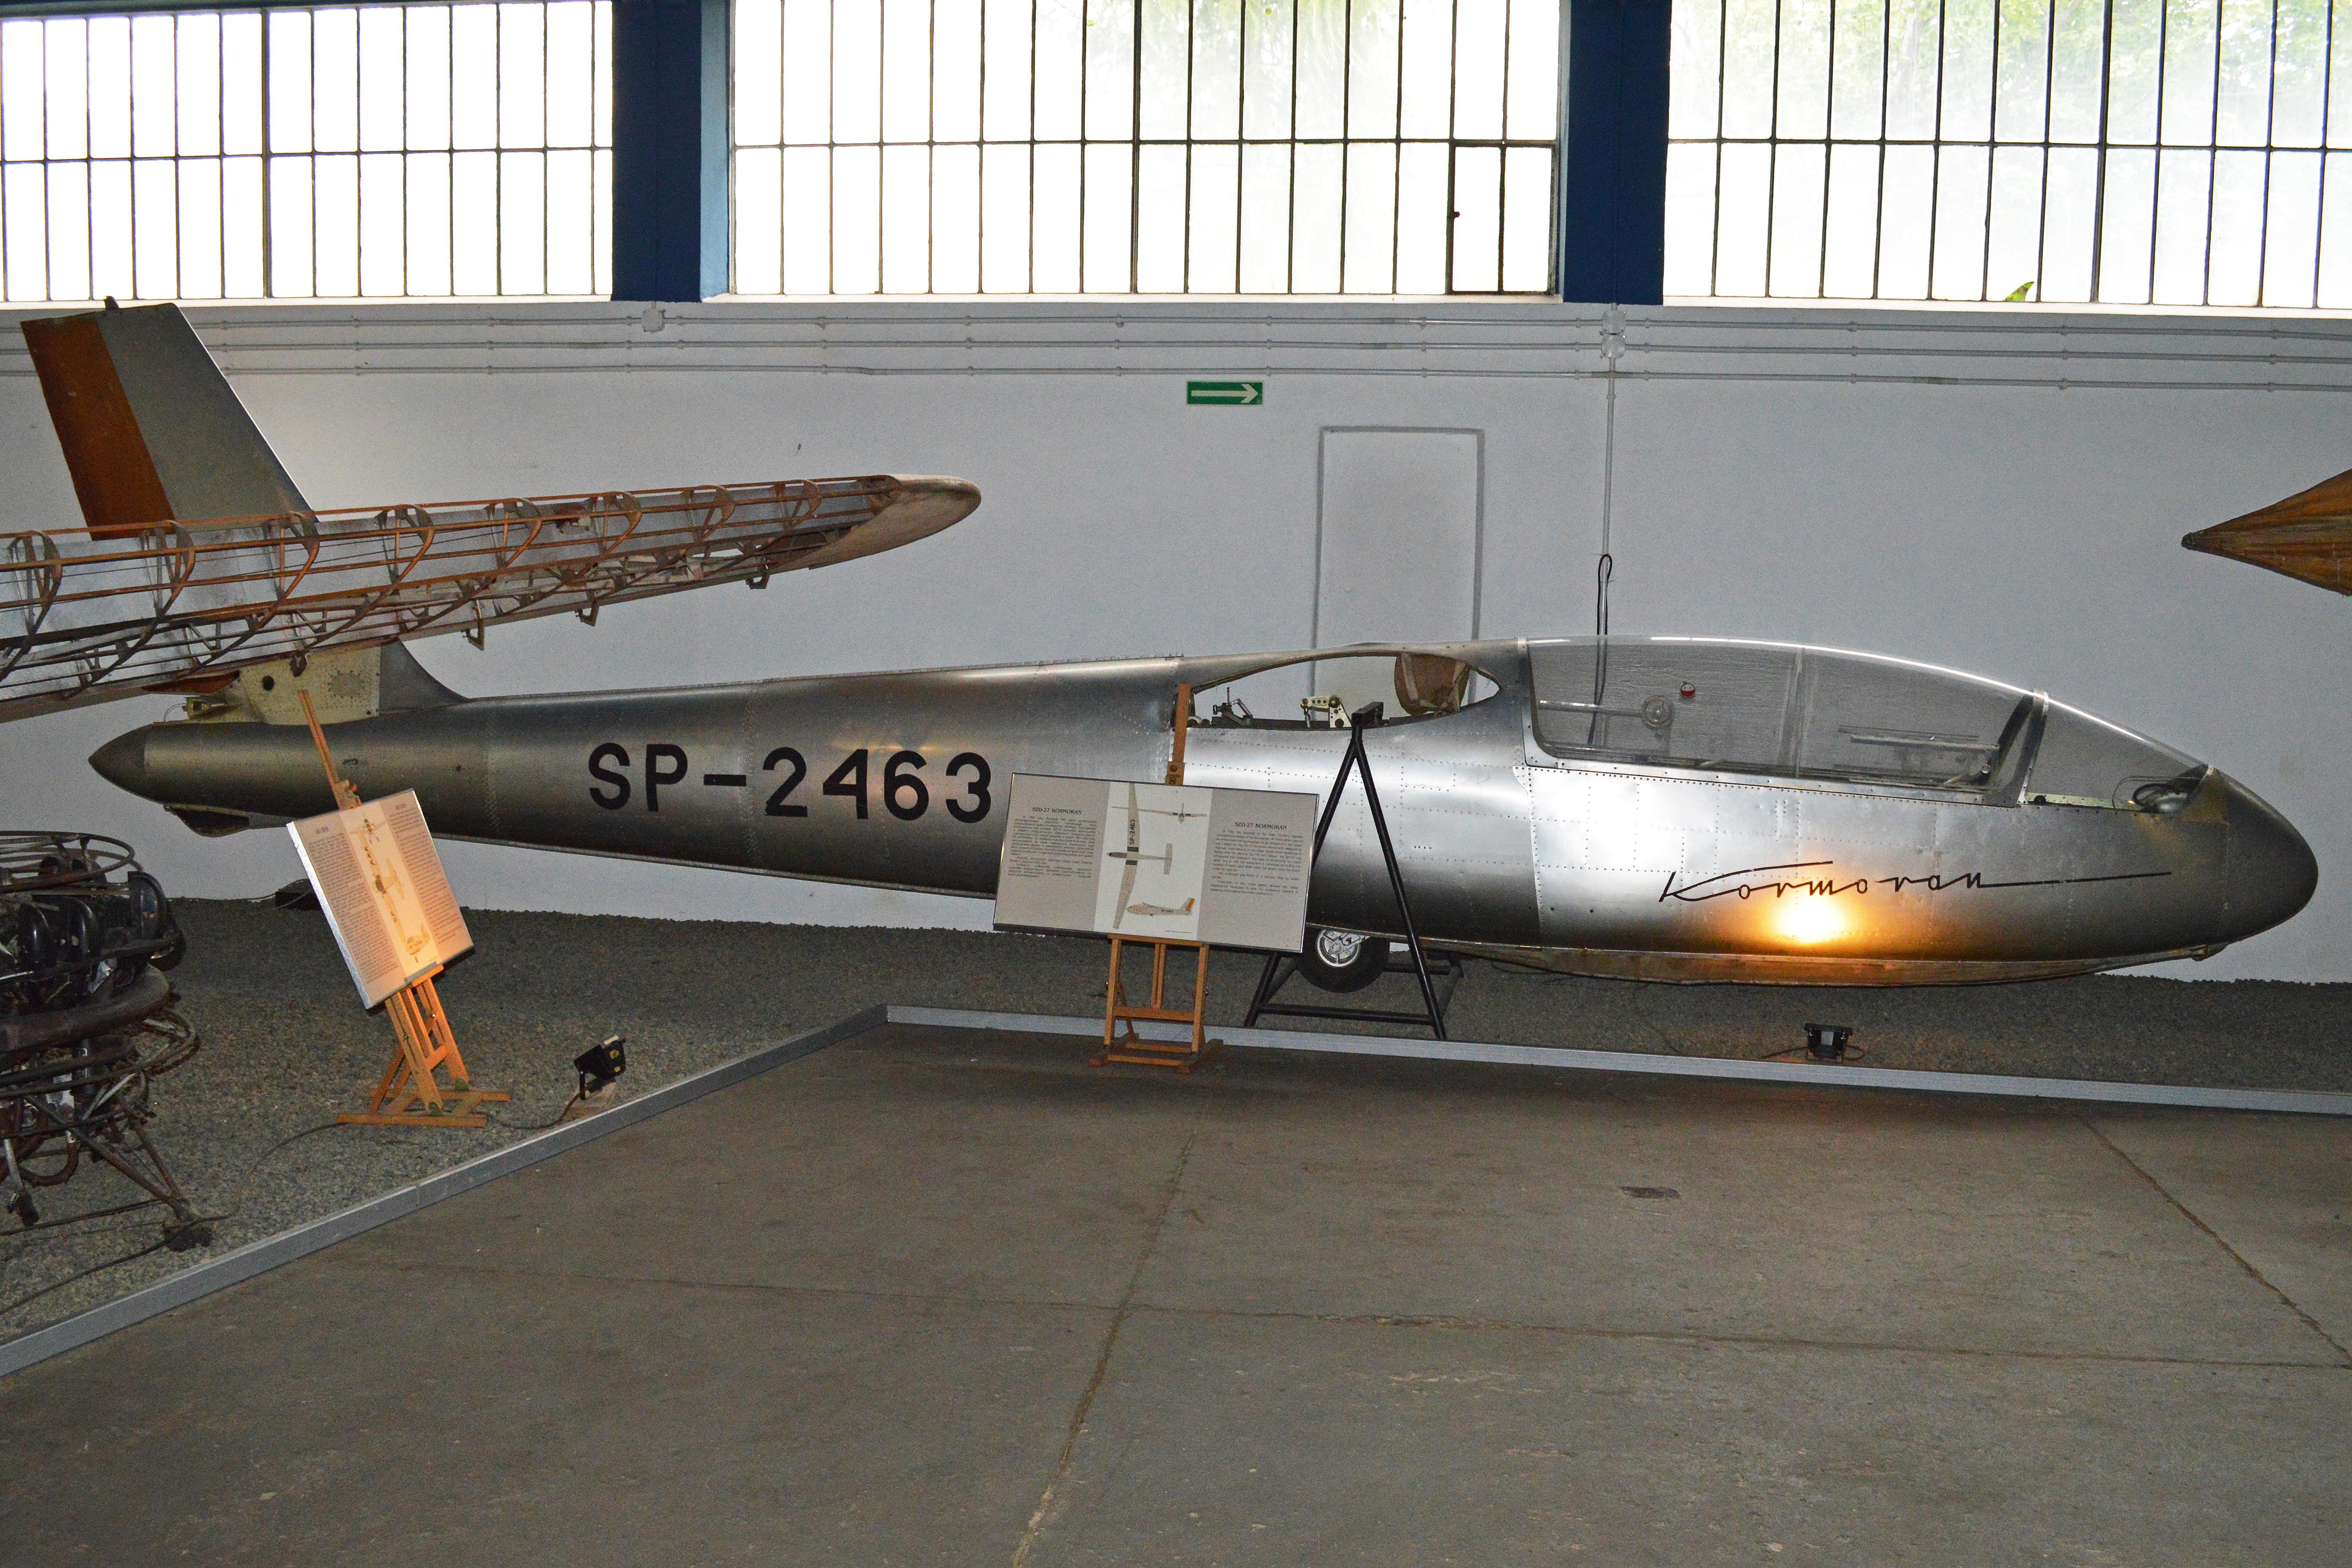 File:SZD-27 Kormoran 'SP-2463' (14420719412).jpg